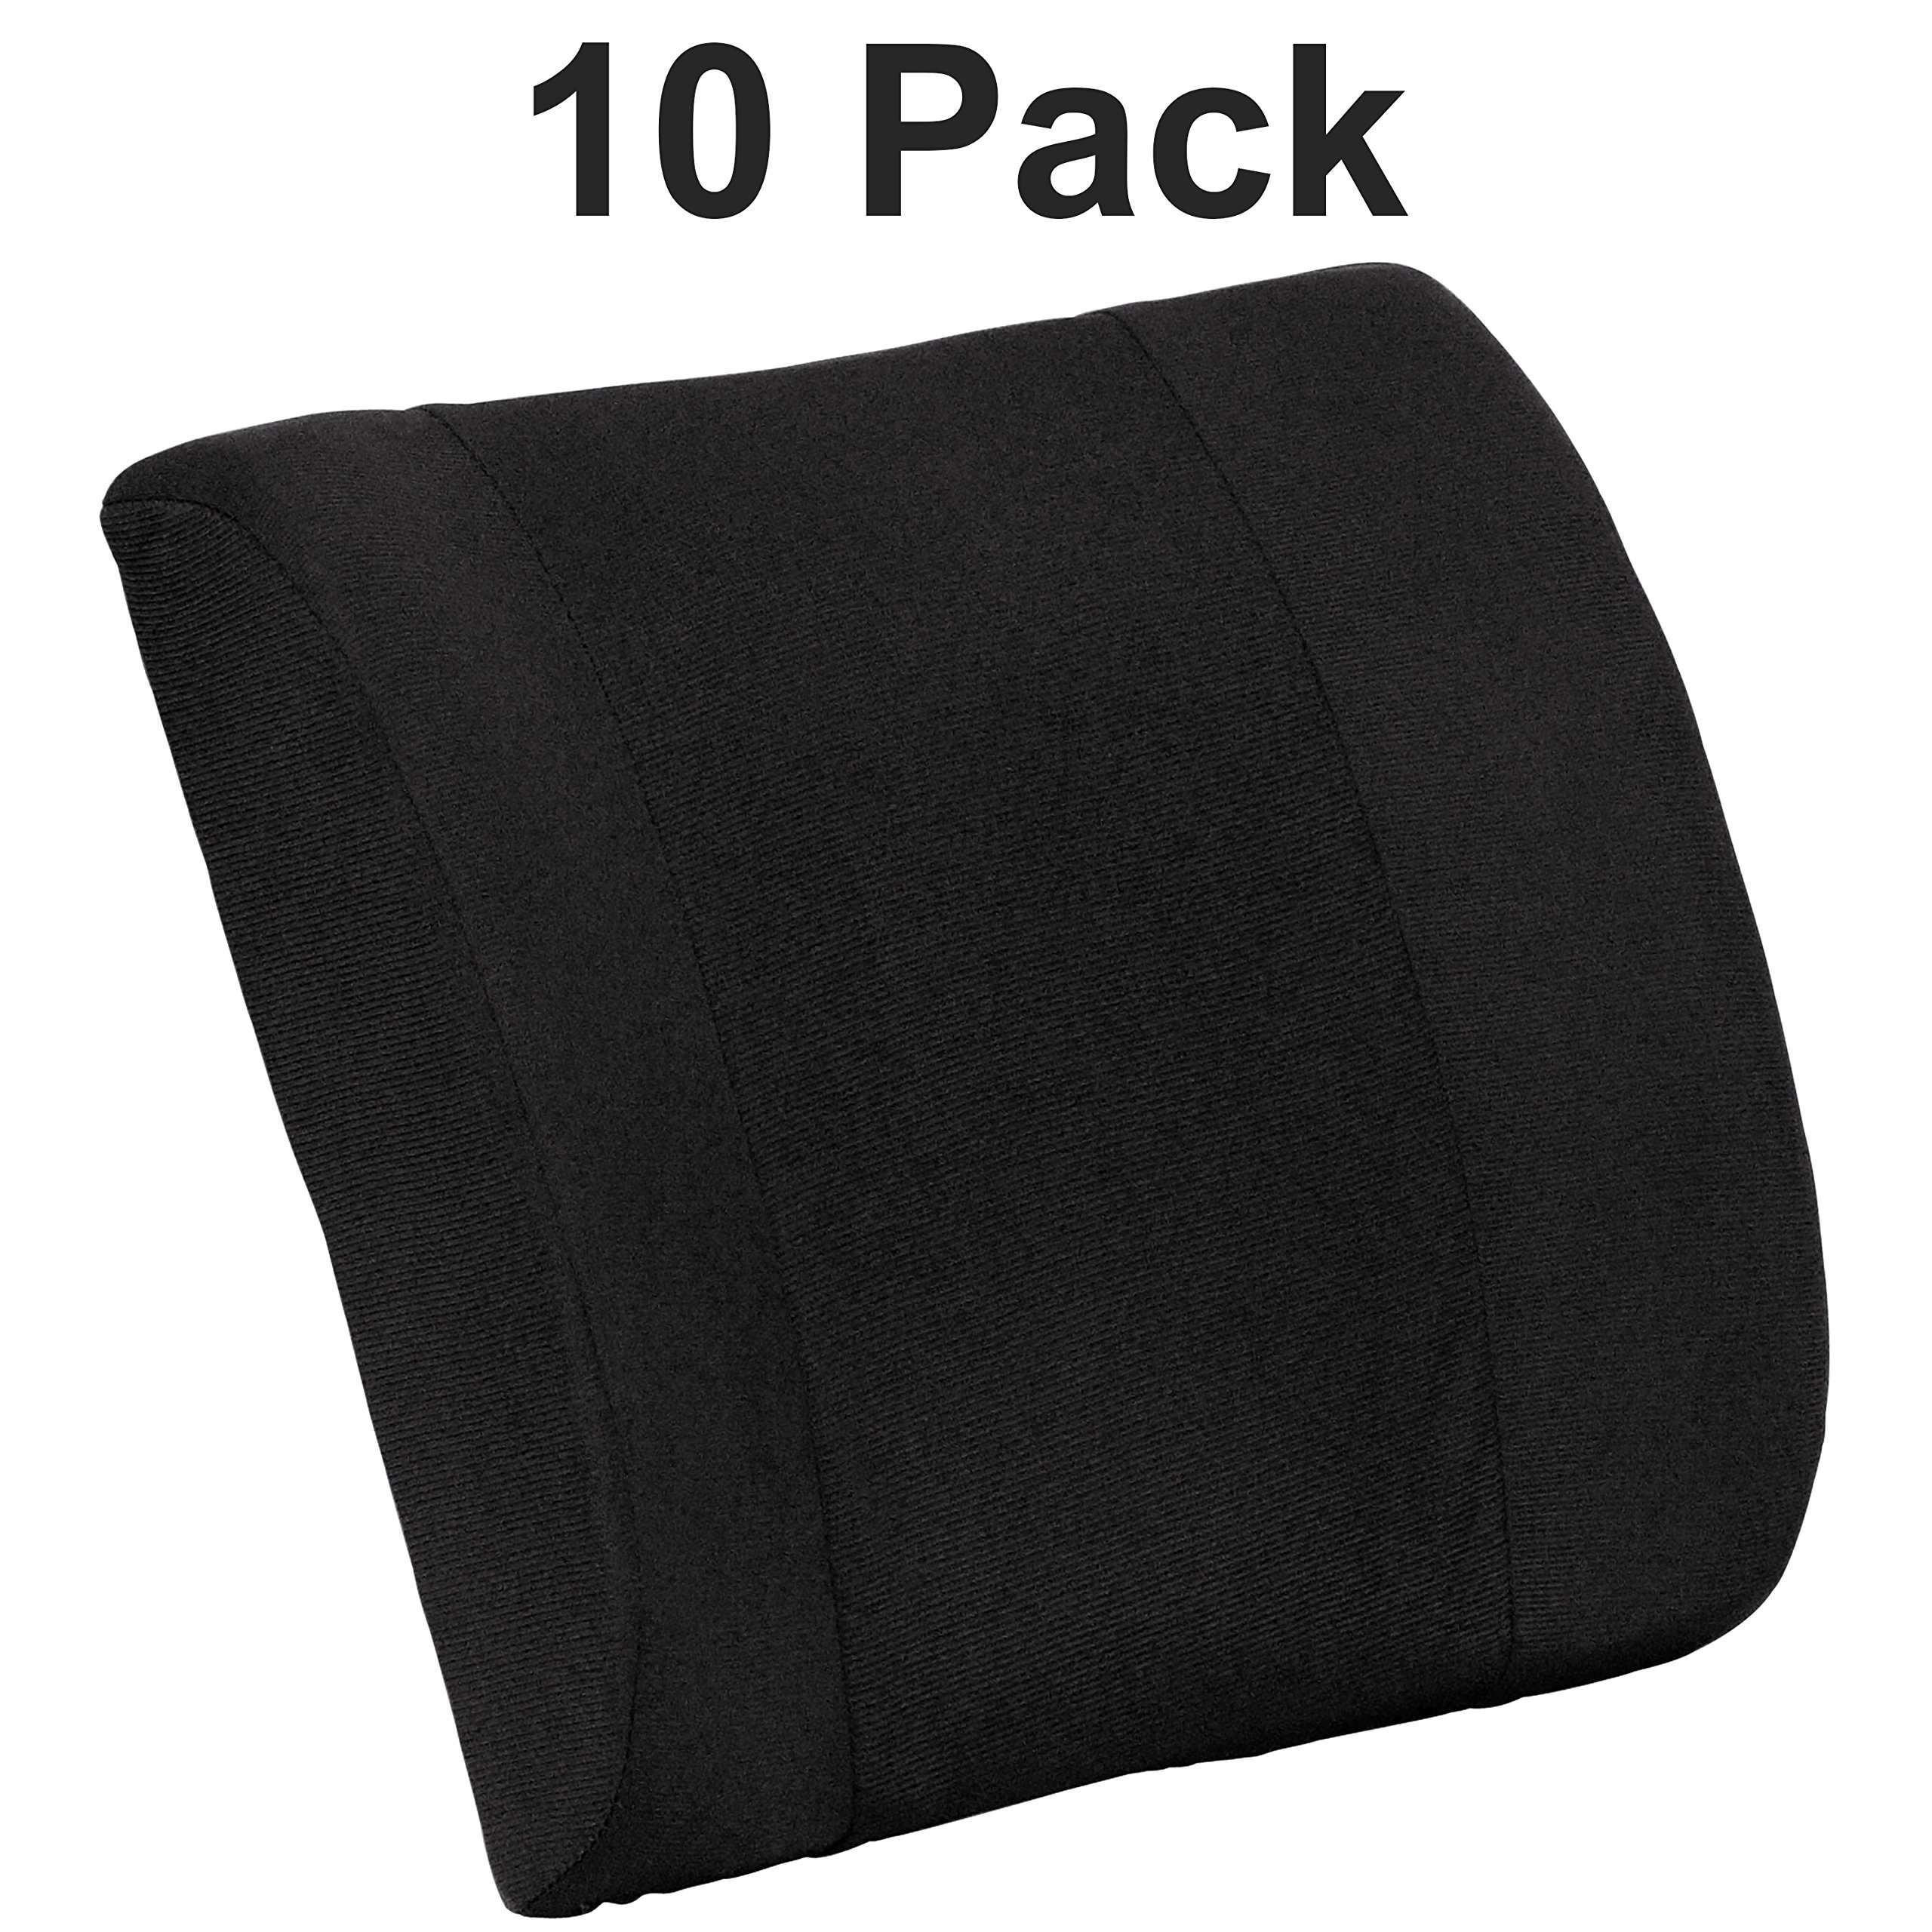 Flash Furniture 10 Pk. Lumbar Cushion with Strap by Flash Furniture